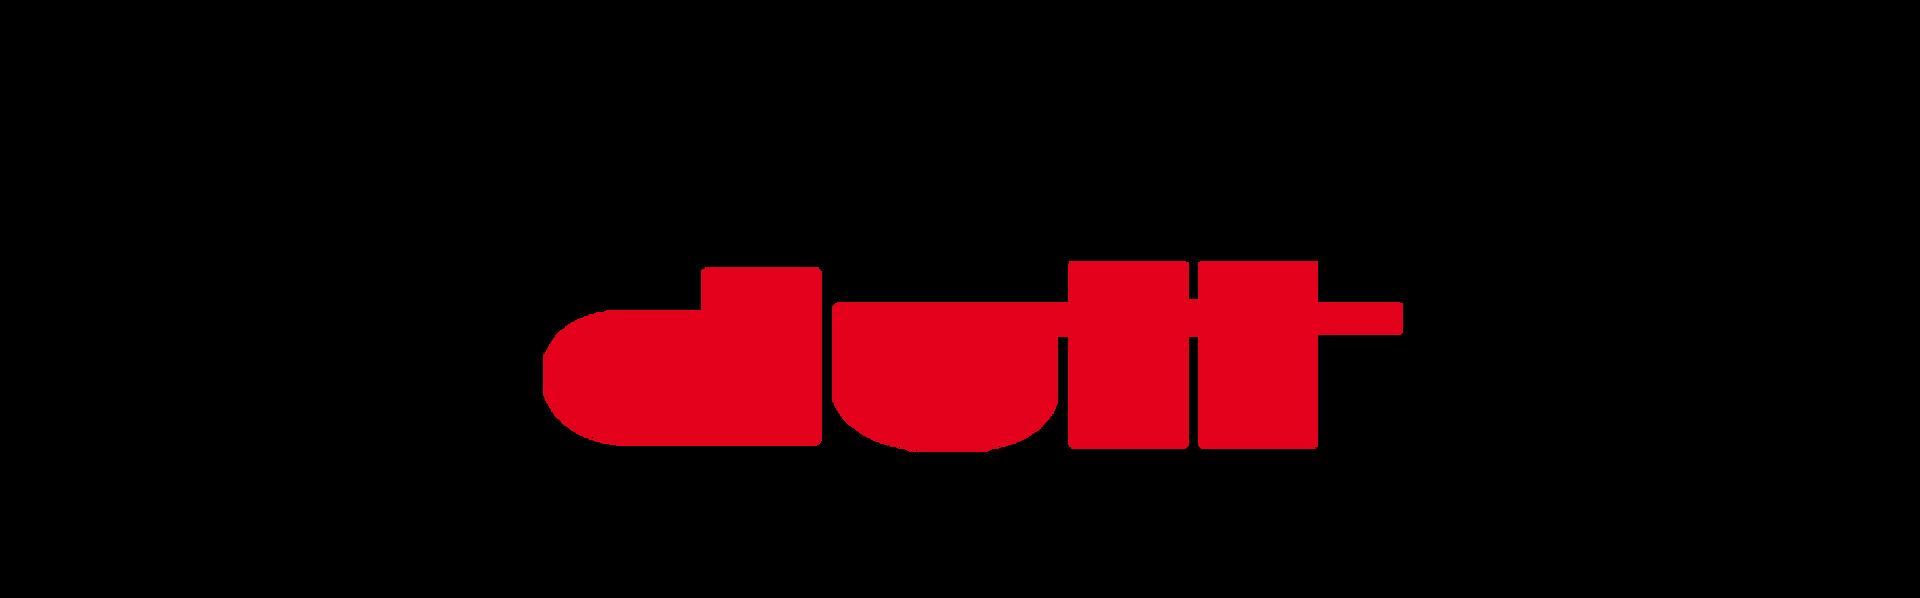 Dutt_Motorsport_logo2.png